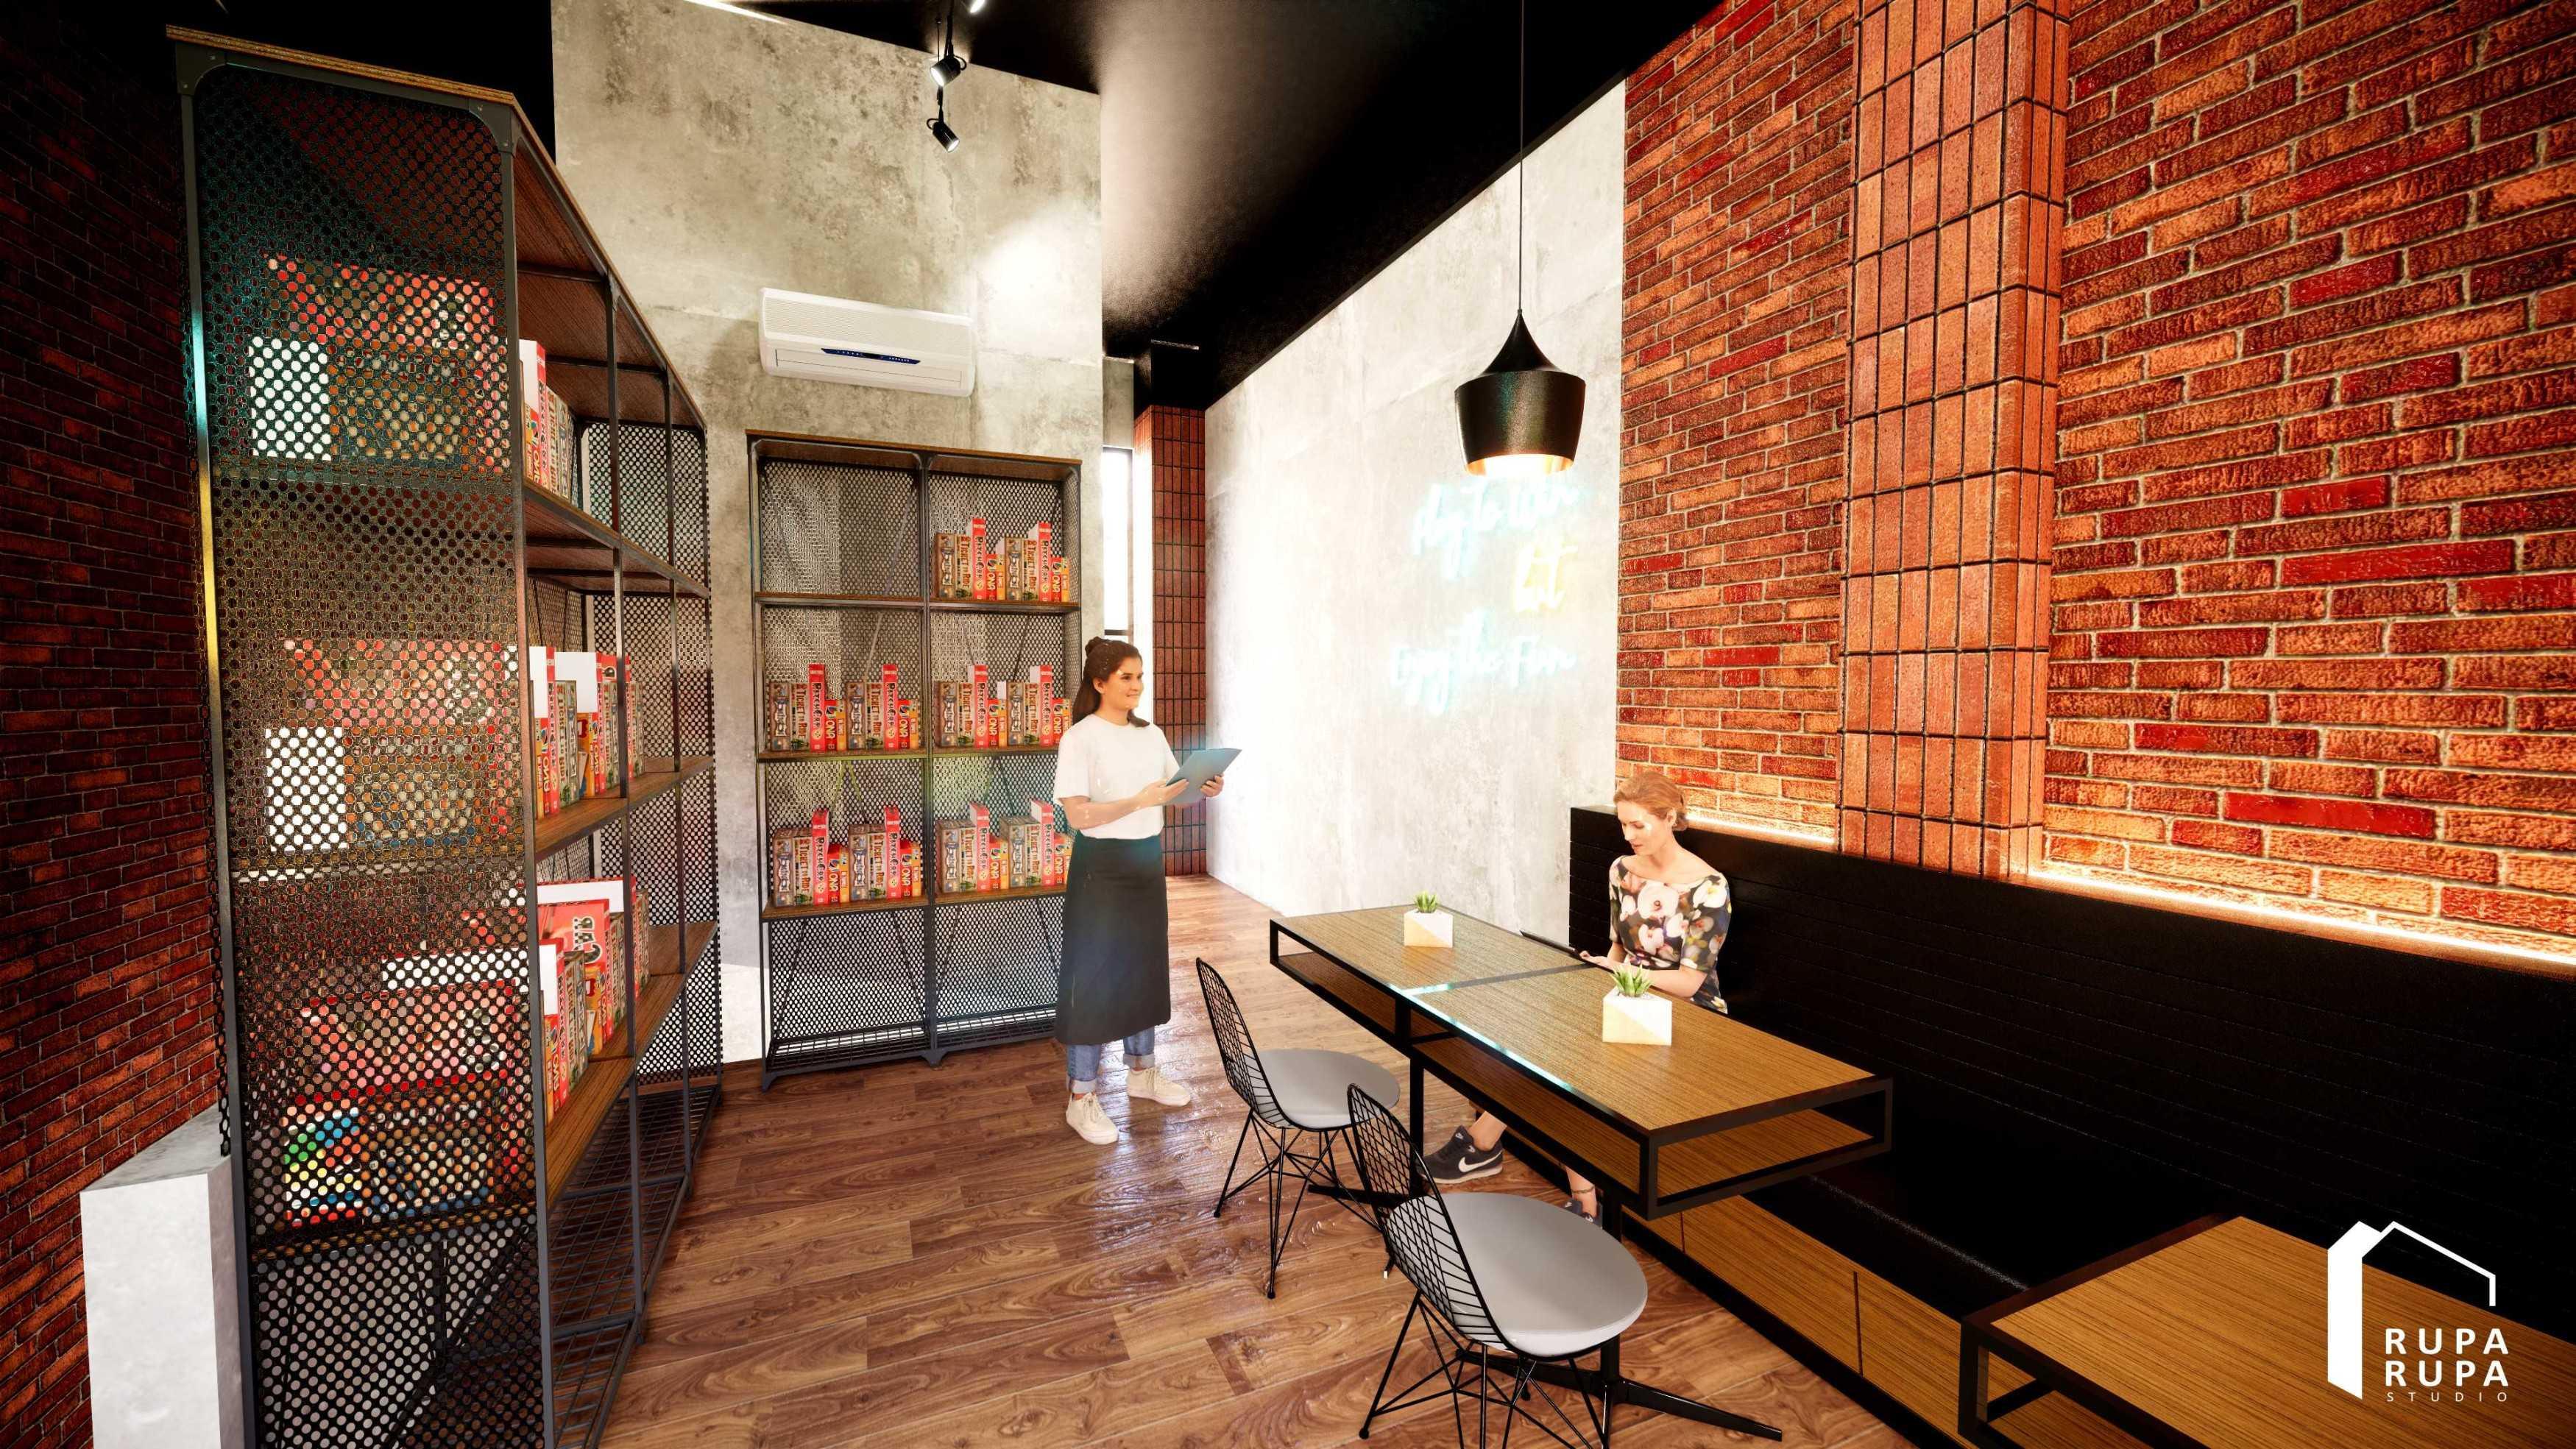 Studio Rupa Rupa Drupadi Corner Cafe Bali, Indonesia Bali, Indonesia Studio-Rupa-Rupa-Drupadi-Corner-Cafe   88065